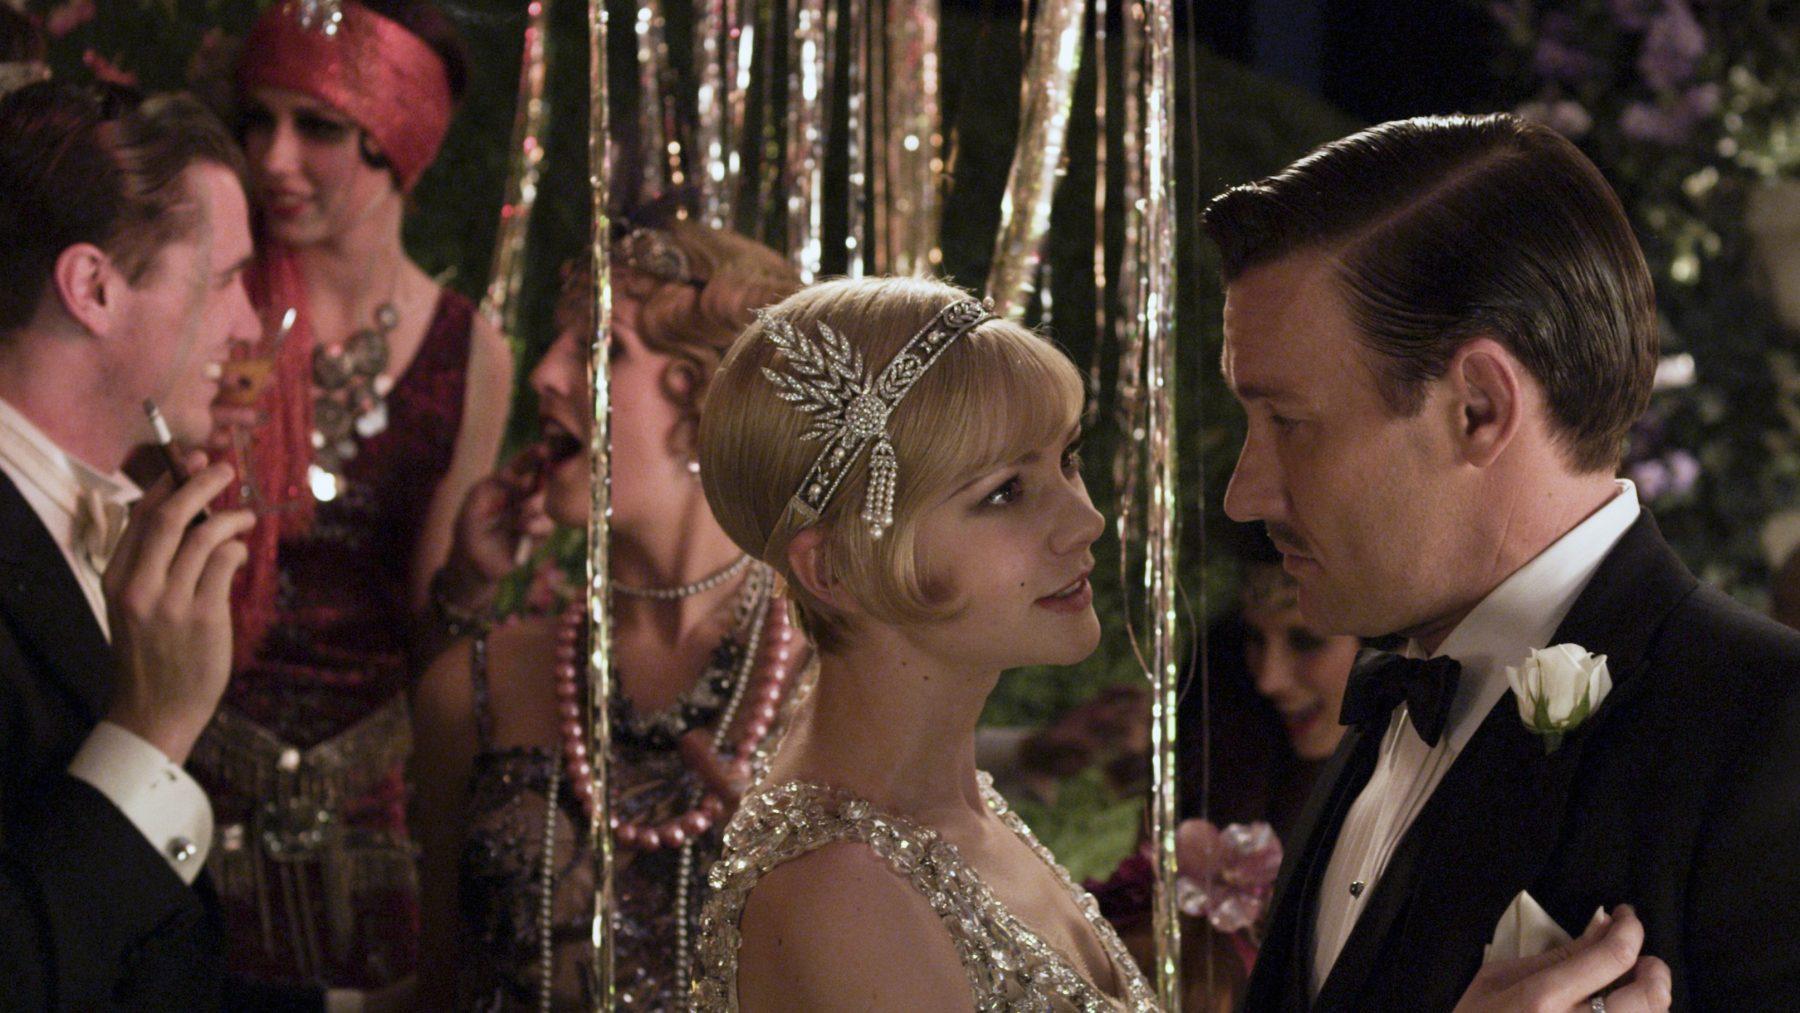 Losbandigheid en 'Roaring Twenties' na de coronacrisis